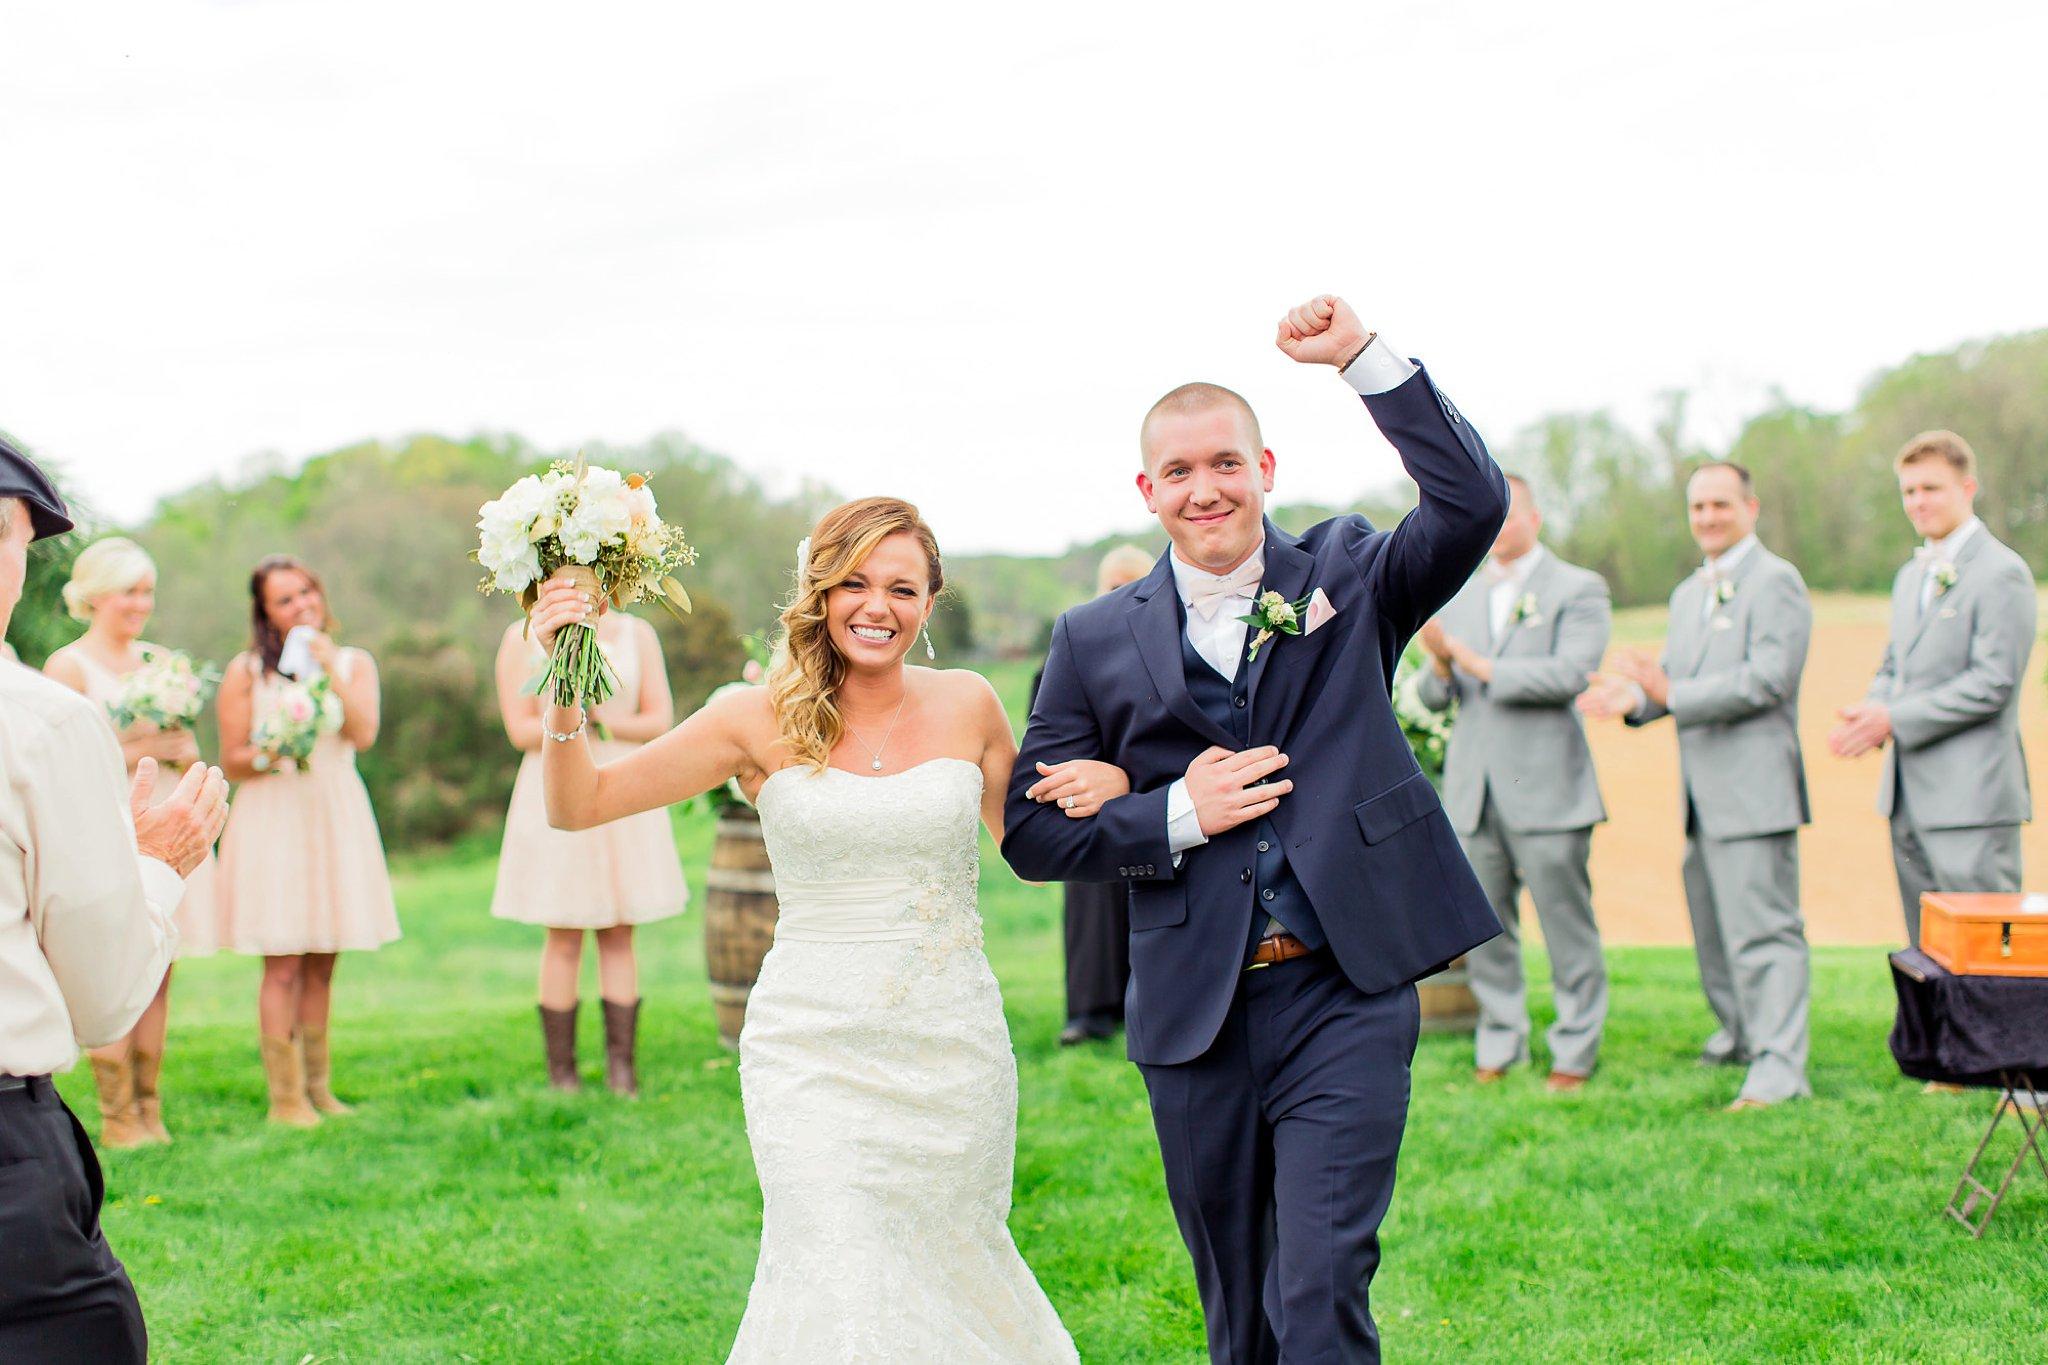 Spring Hill Manor Wedding Photos Maryland Wedding Photographer-150.jpg